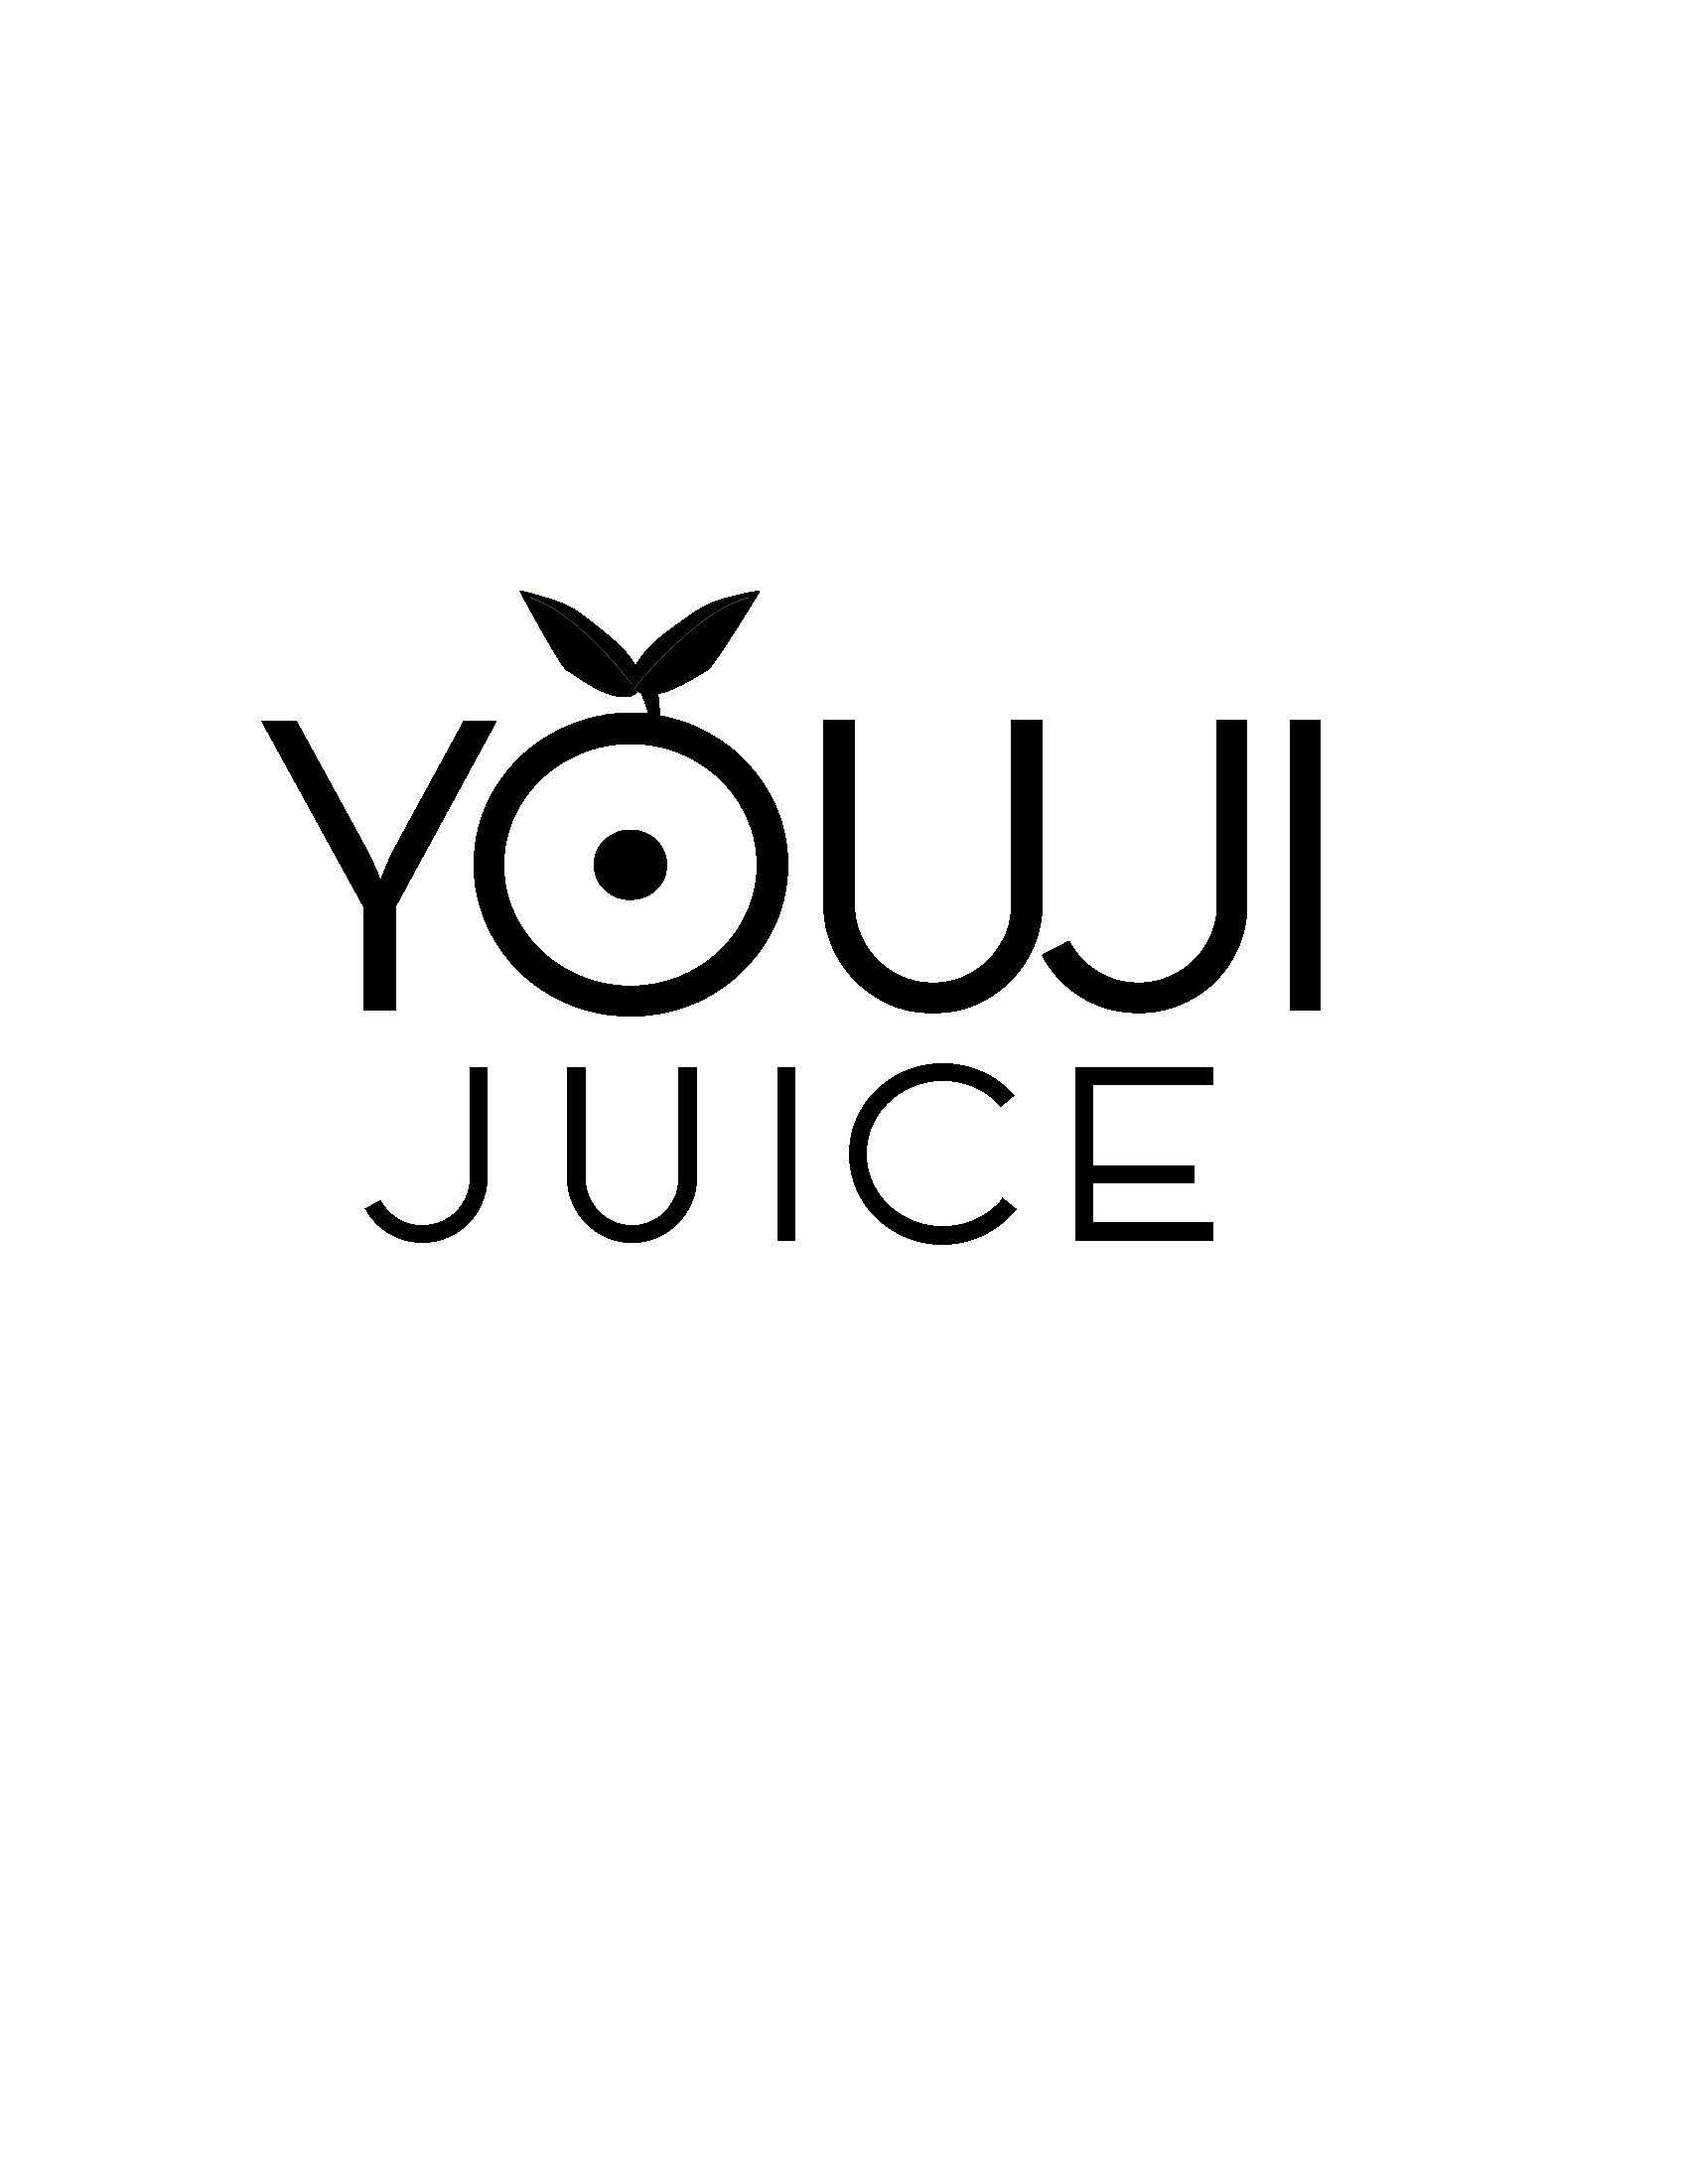 youji juice final logo company.jpg